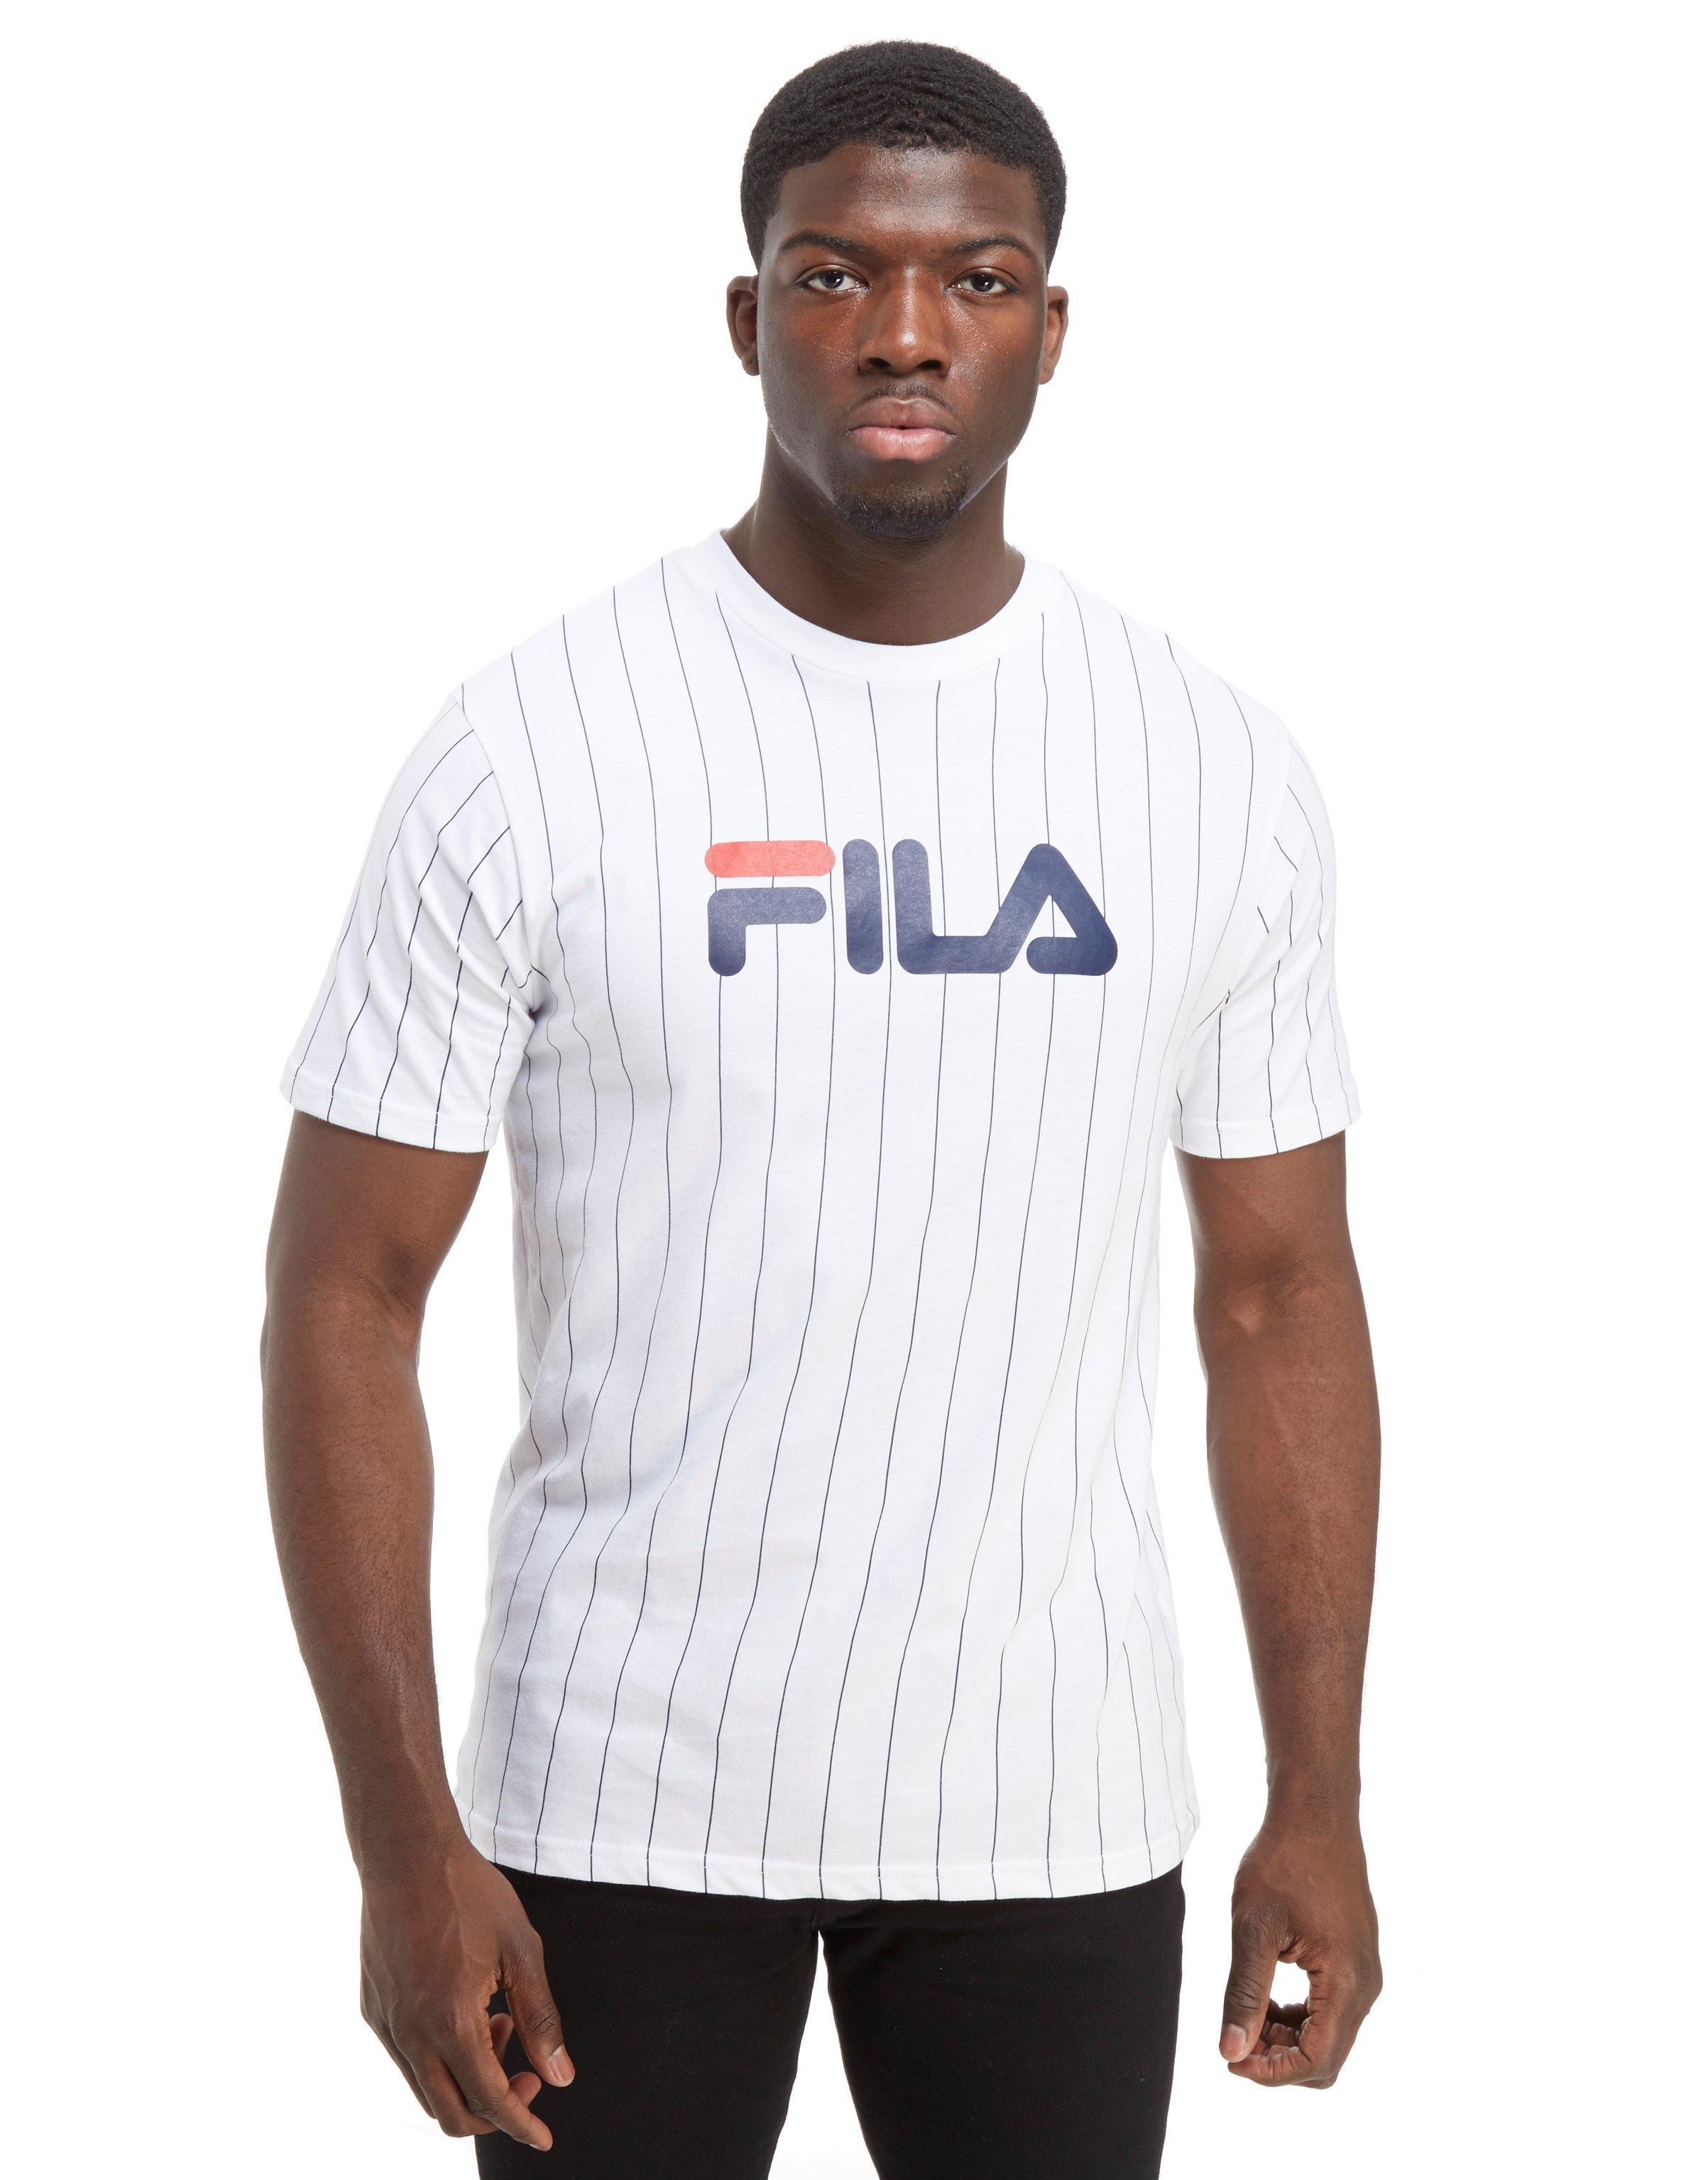 a2331a5e39 Fila Gregor Stripe T-shirt in White for Men - Lyst